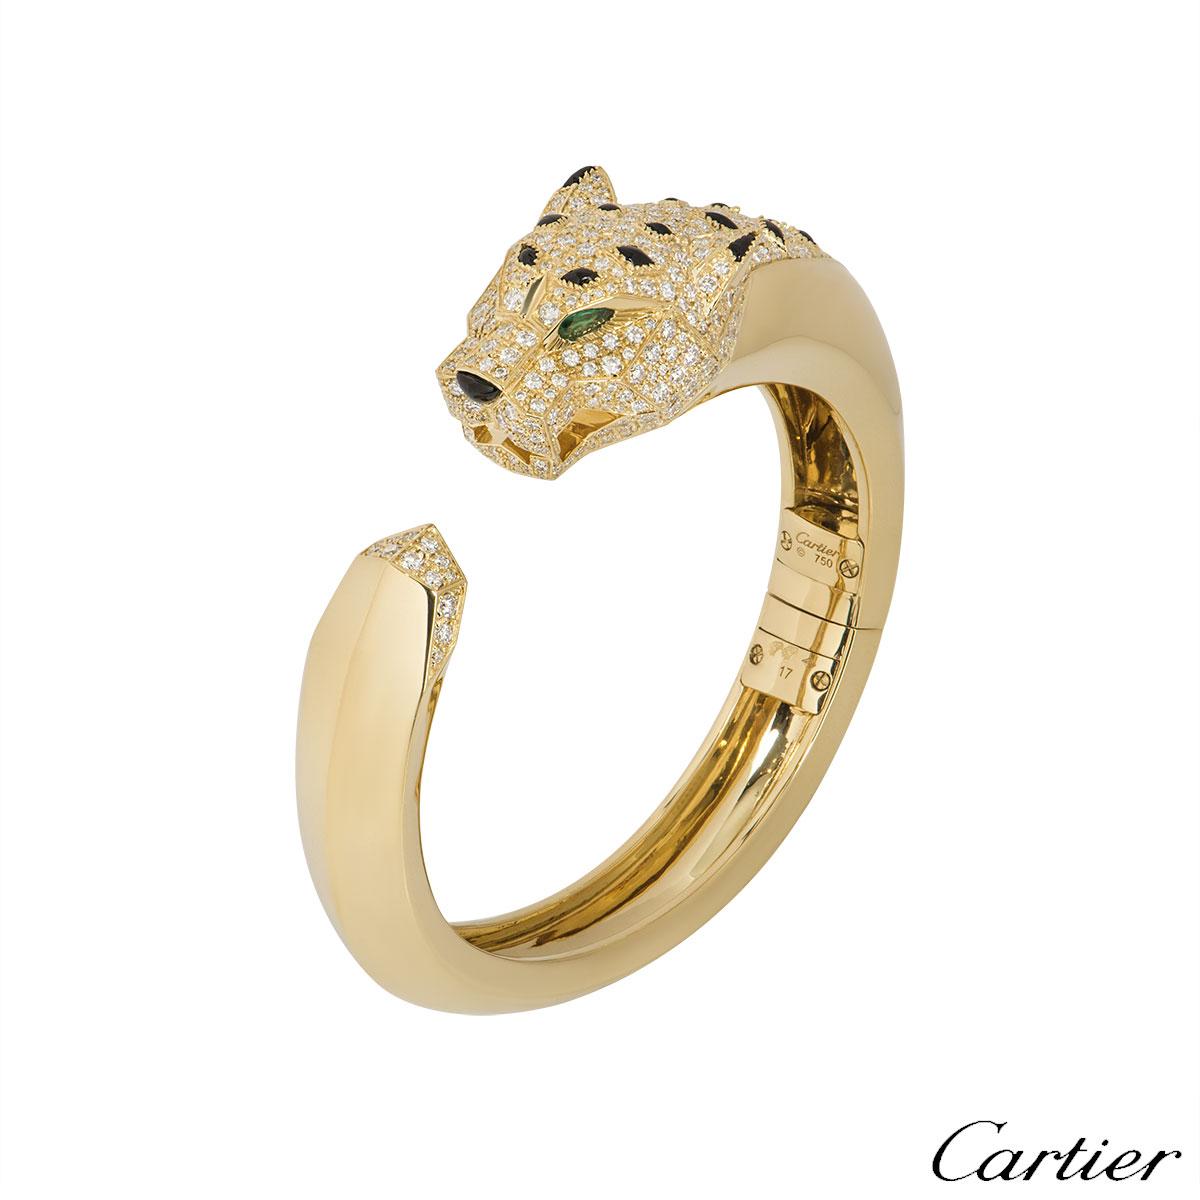 Cartier Yellow Gold Diamond Panthere De Cartier Bracelet N6035317